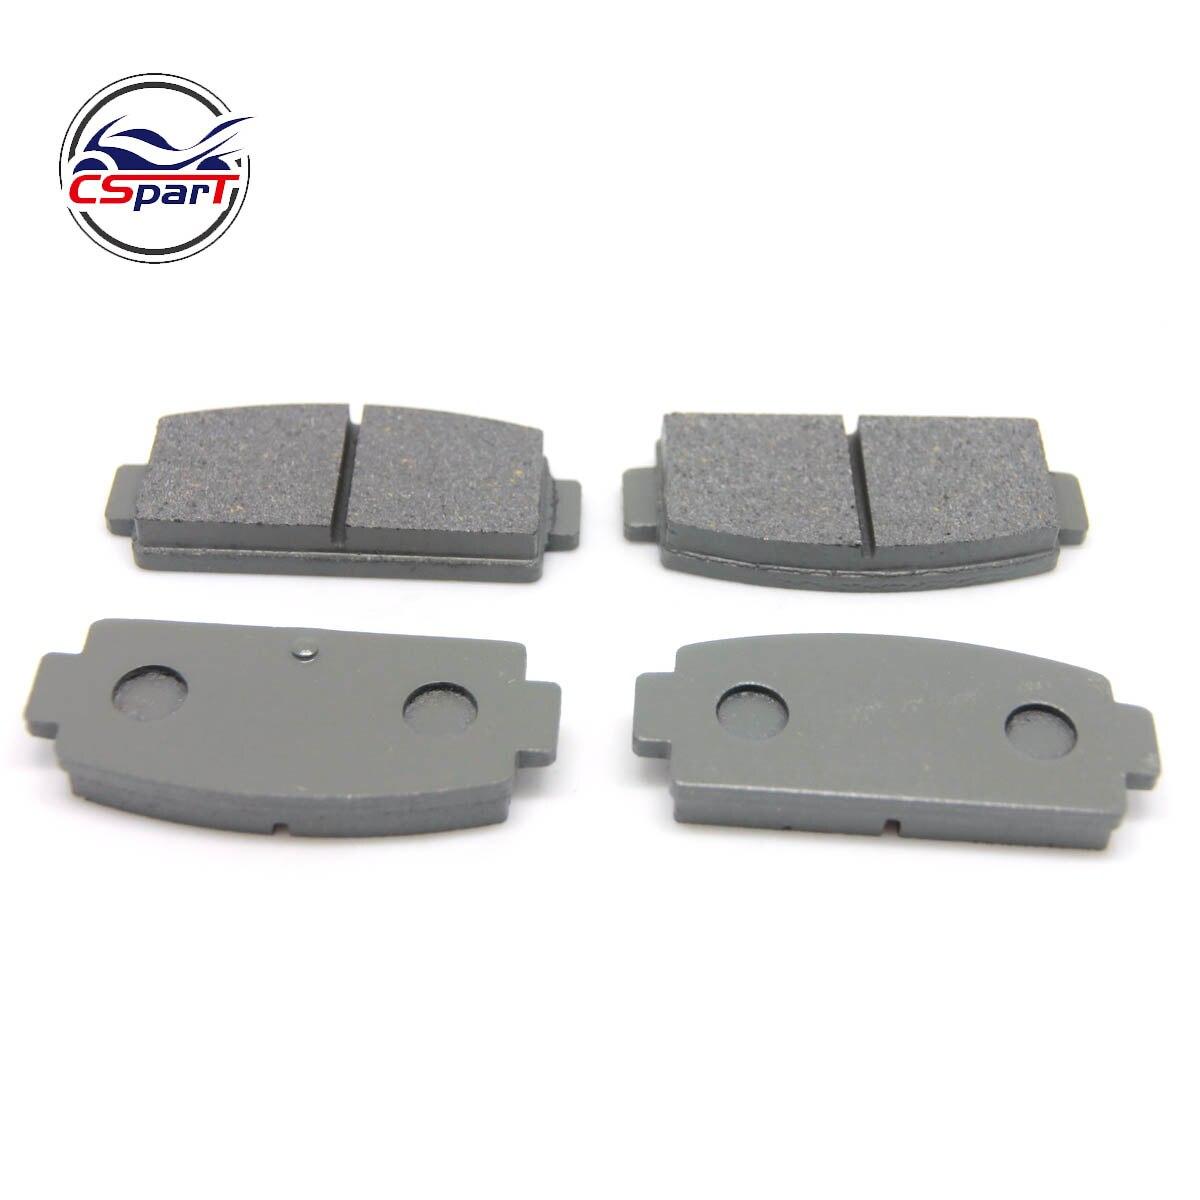 2 Sets 4PCS Rear  Brake Pad For CFMoto ZFORCE 500 550 600 800 500CC 600CC 800CC Z5 Z6 Z8 SSV 9060-081010 7000-0801A0